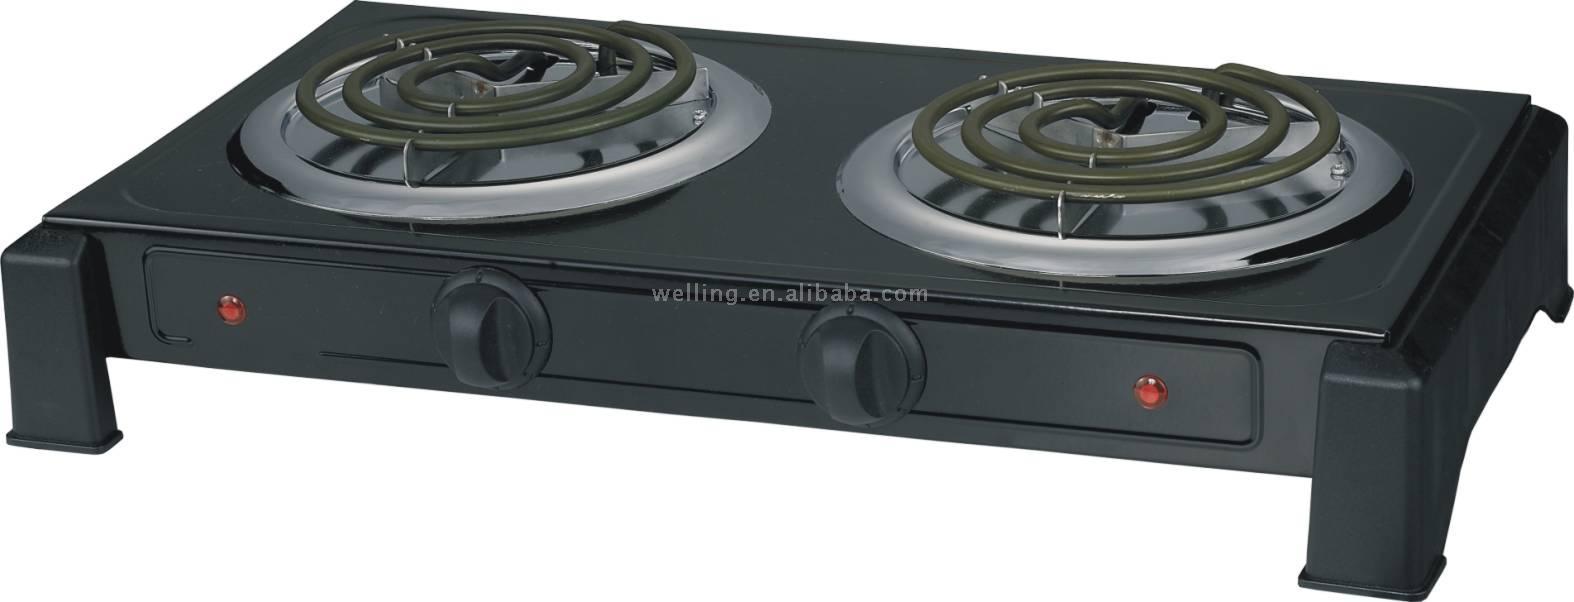 Dise o industrial - Cocina electrica portatil ...